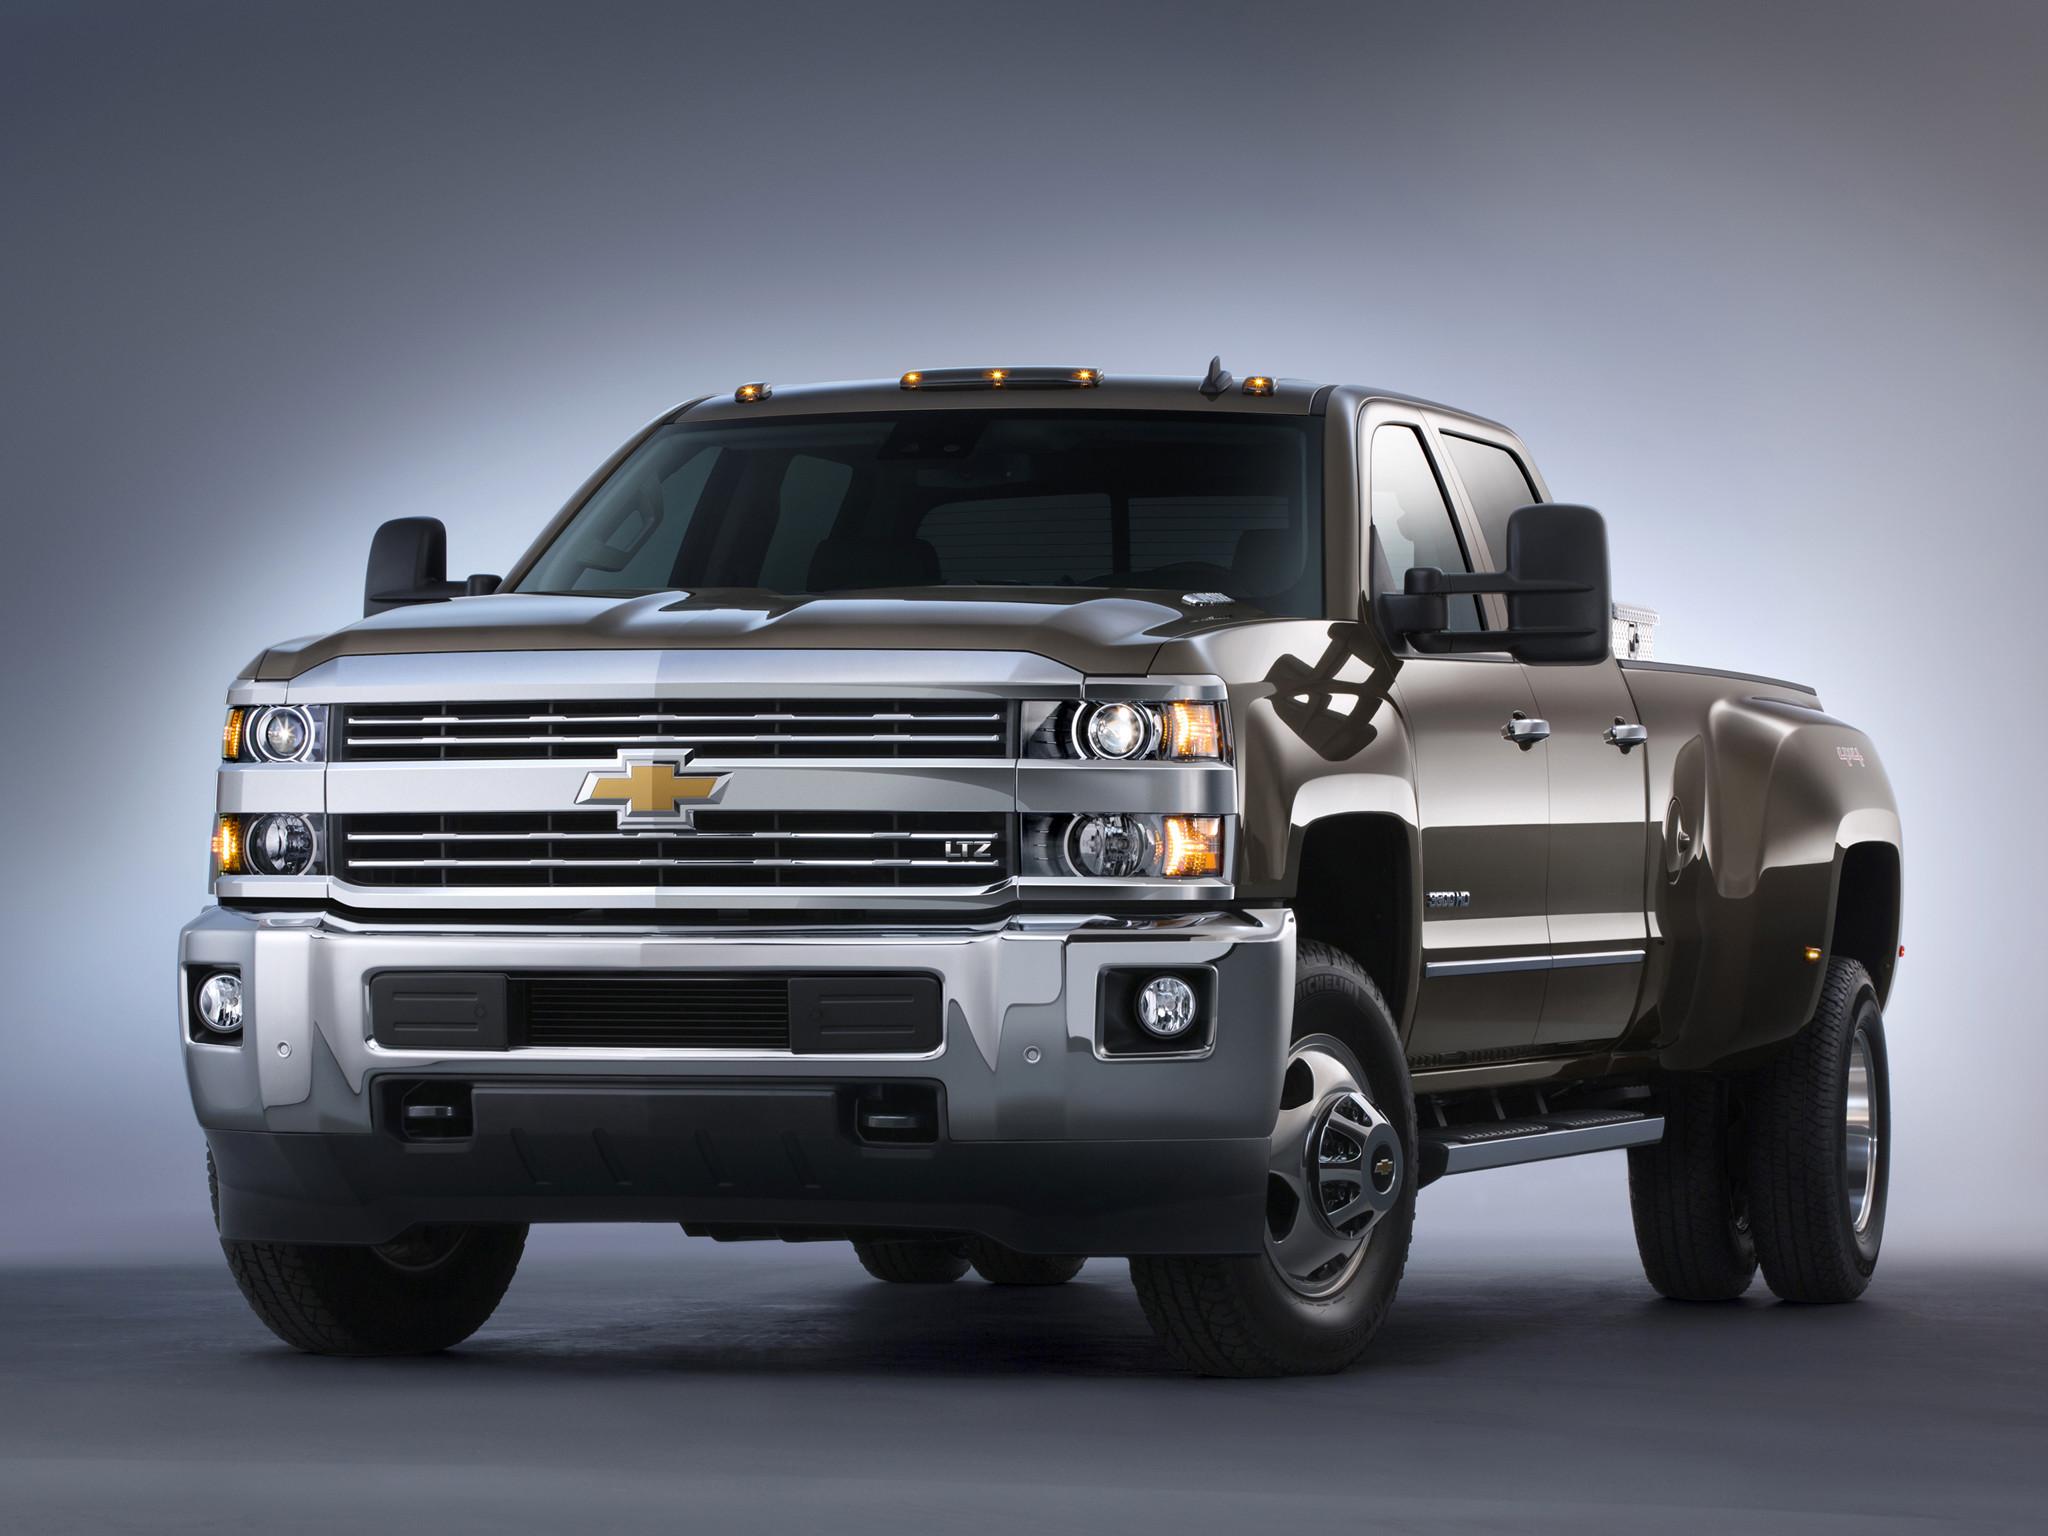 2014 chevrolet silverado 2500 h d ltz z71 crew cab pickup g wallpaper |  CHEVROLET PICKUPS USA #1. | Pinterest | Chevrolet silverado 2500, Silverado  2500 and …